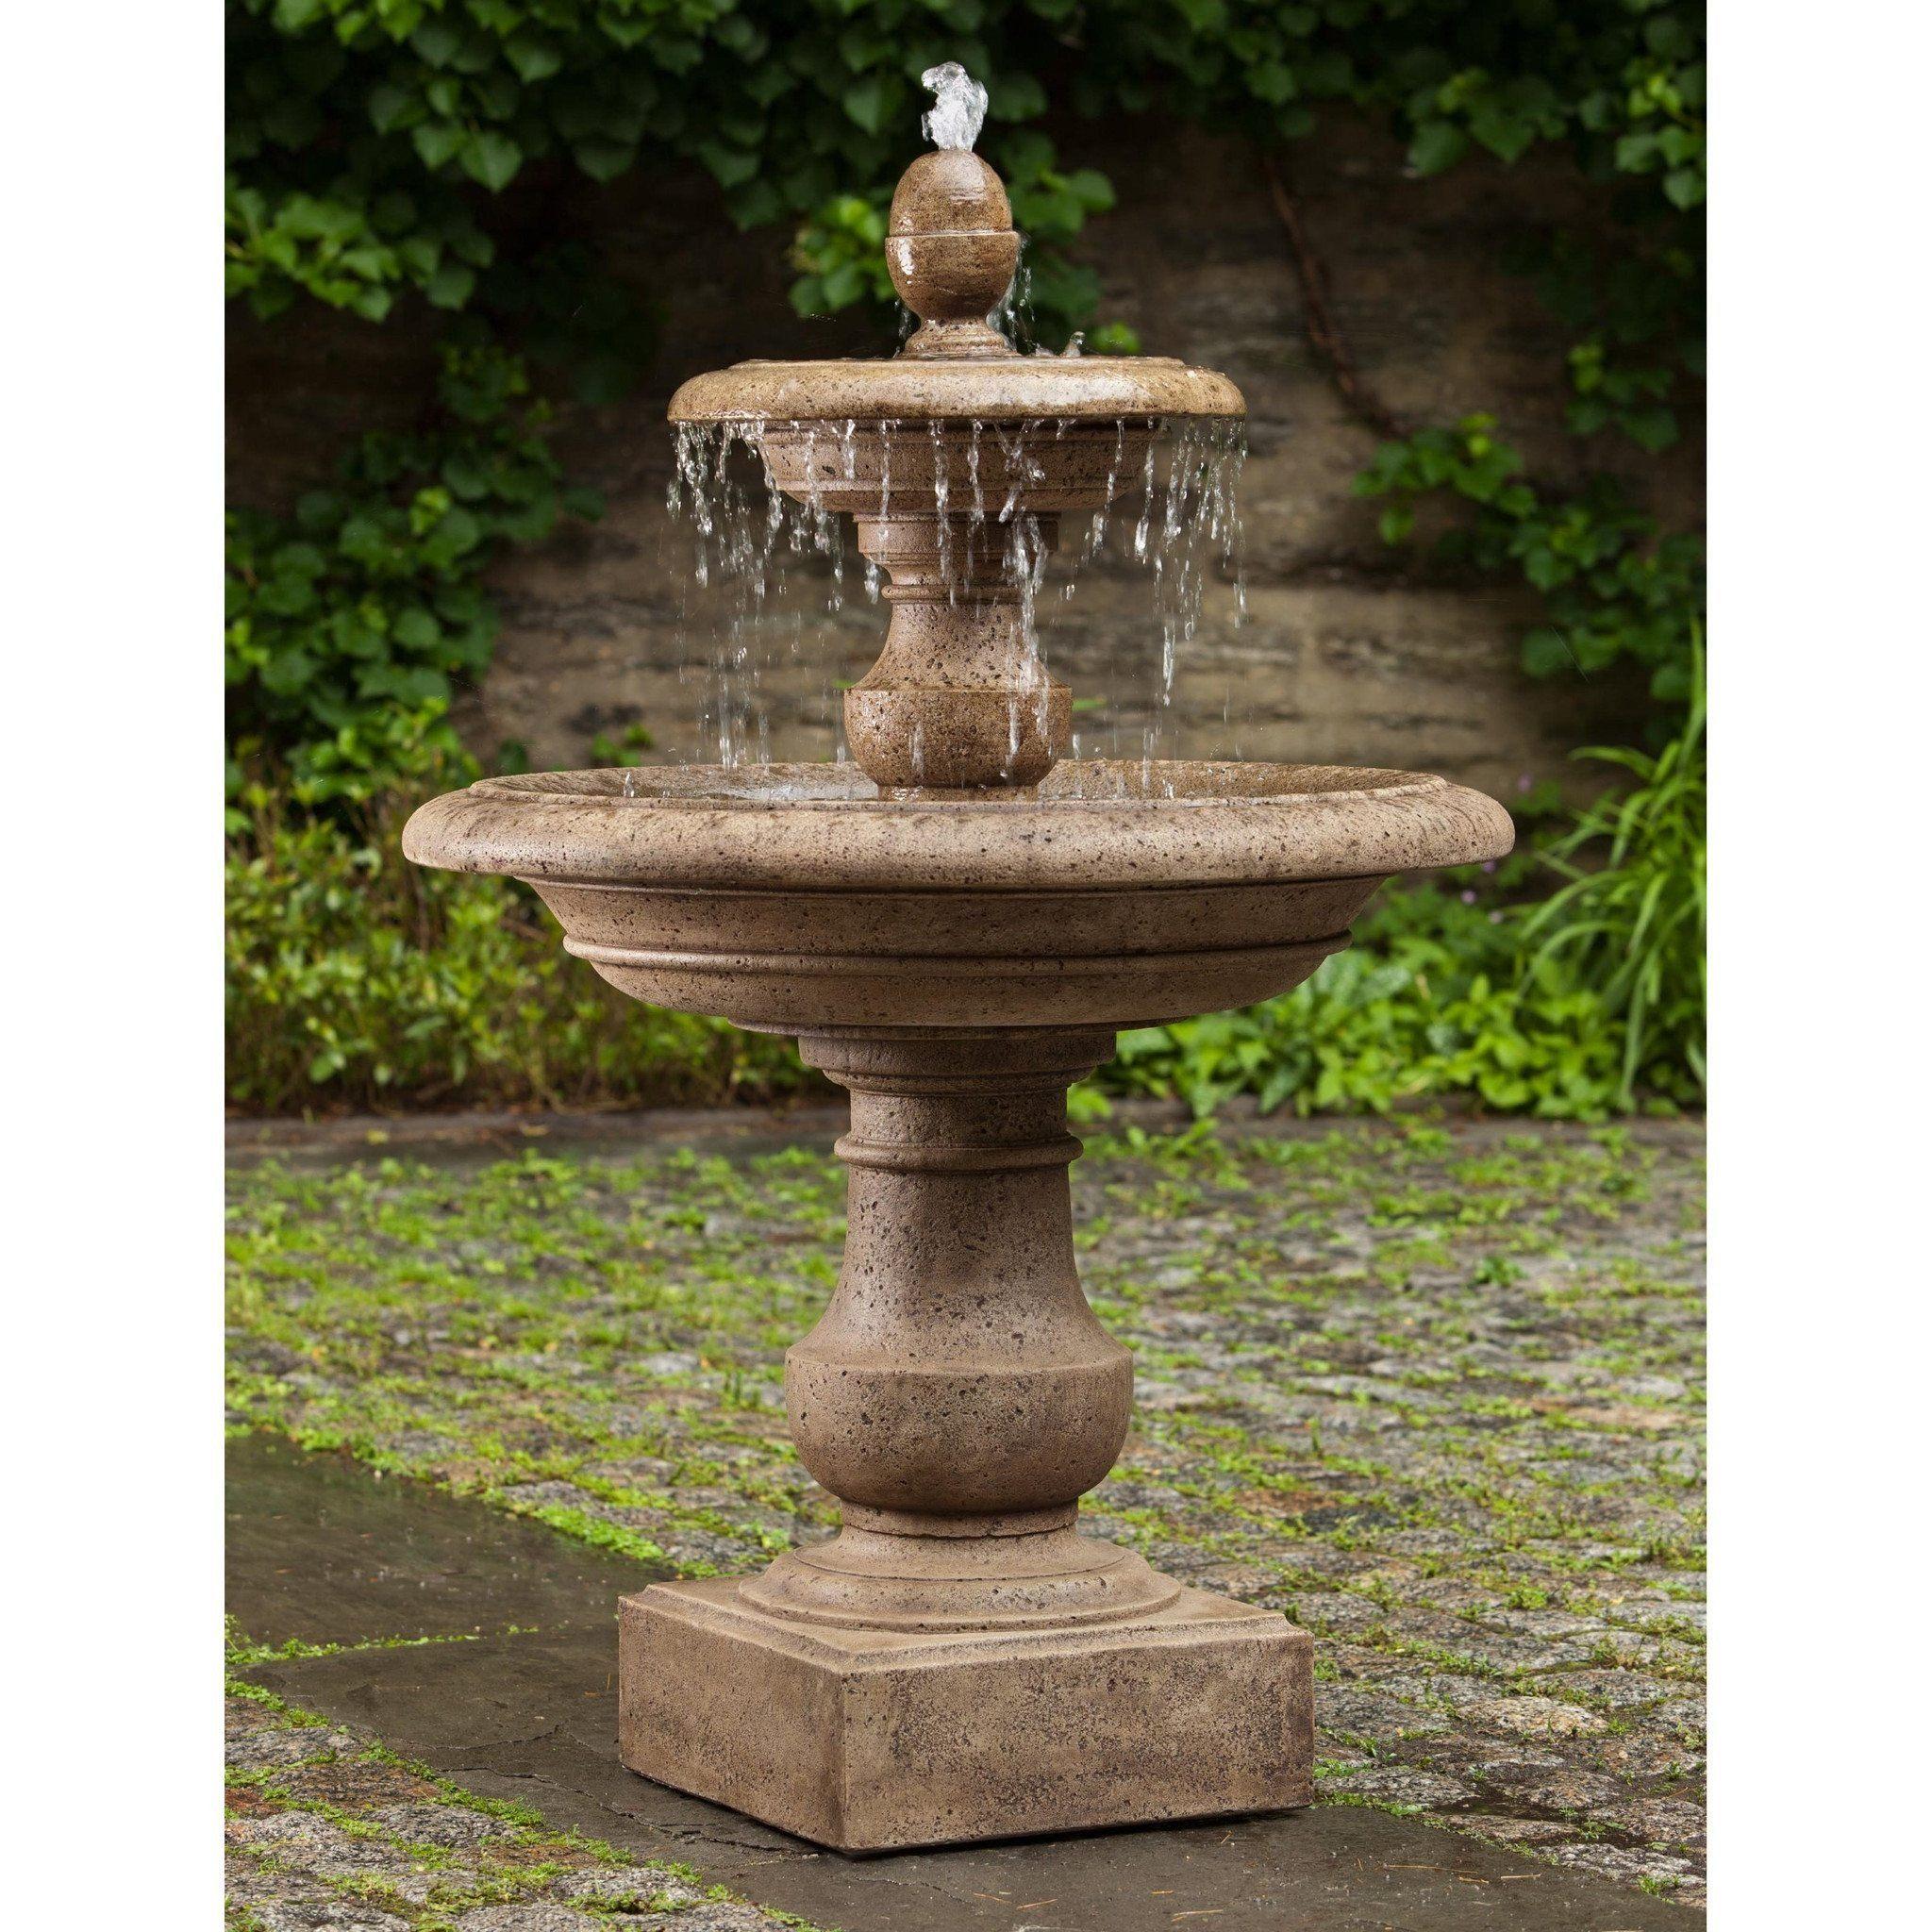 Caterina Tiered Garden Water Fountain | Tiered garden, Water ...